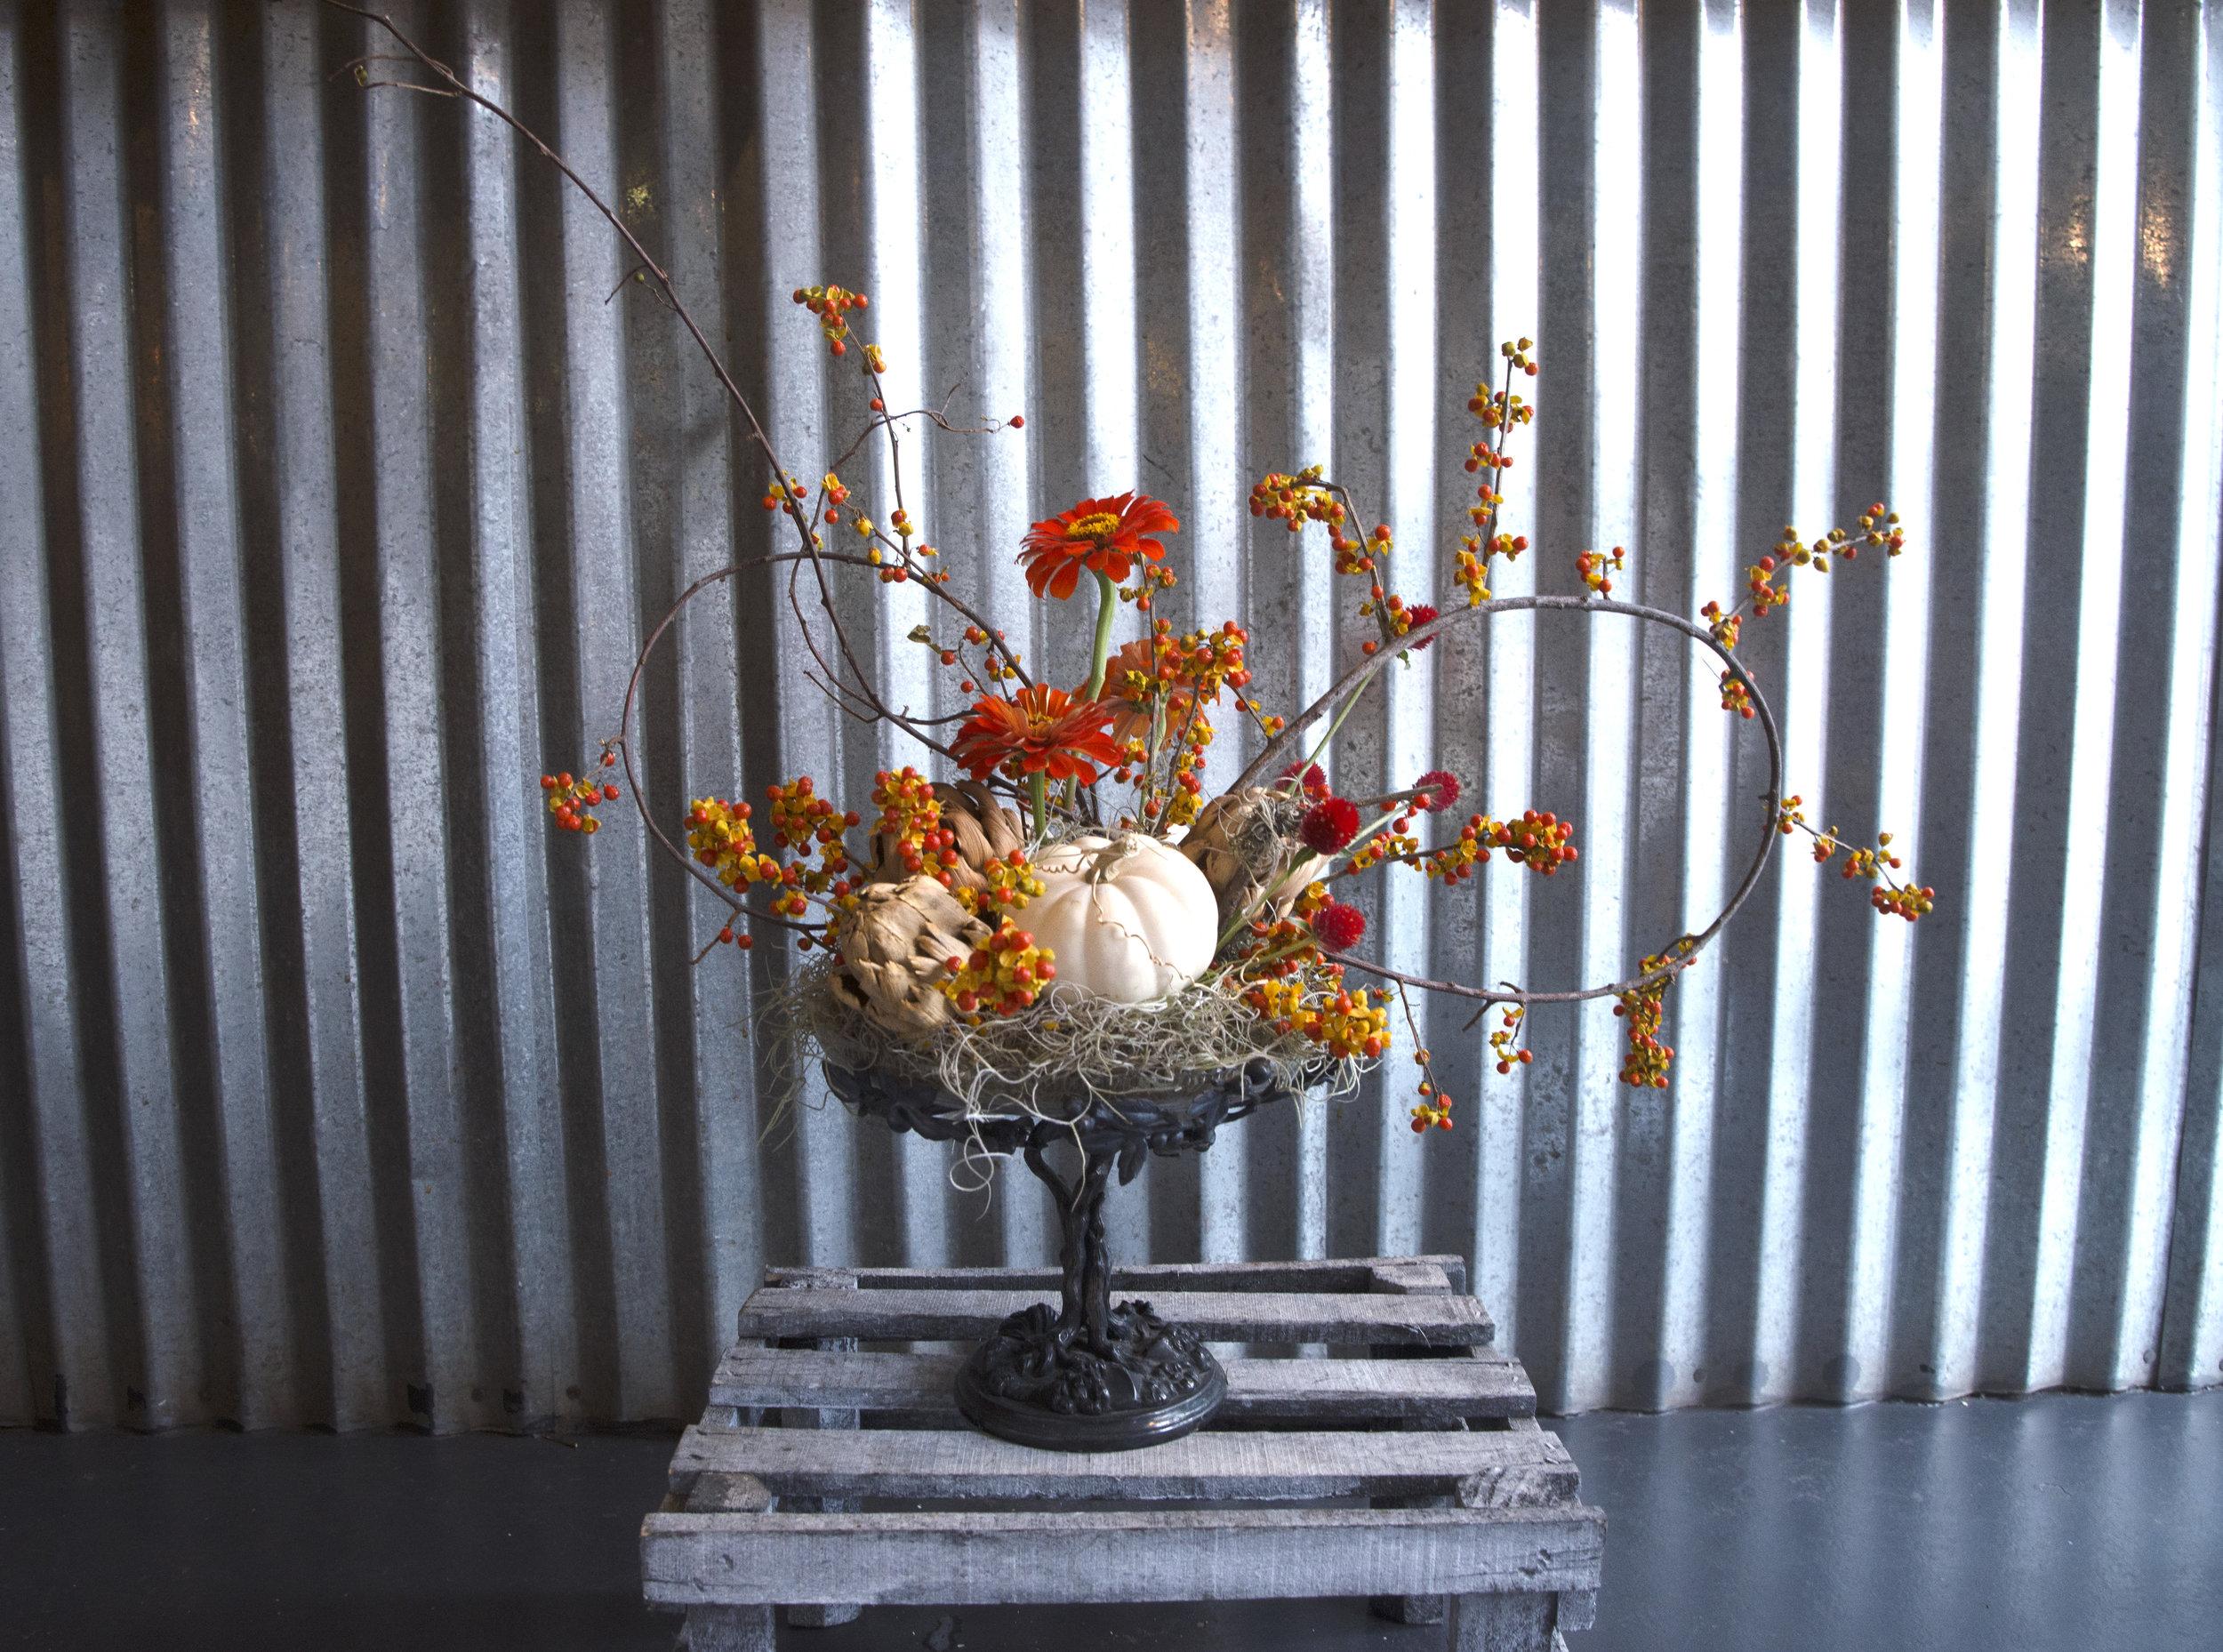 preserved centerpiece denys mitchs flowers thanksgiving centerpiece fresh cut flowers new orleans florist.jpg